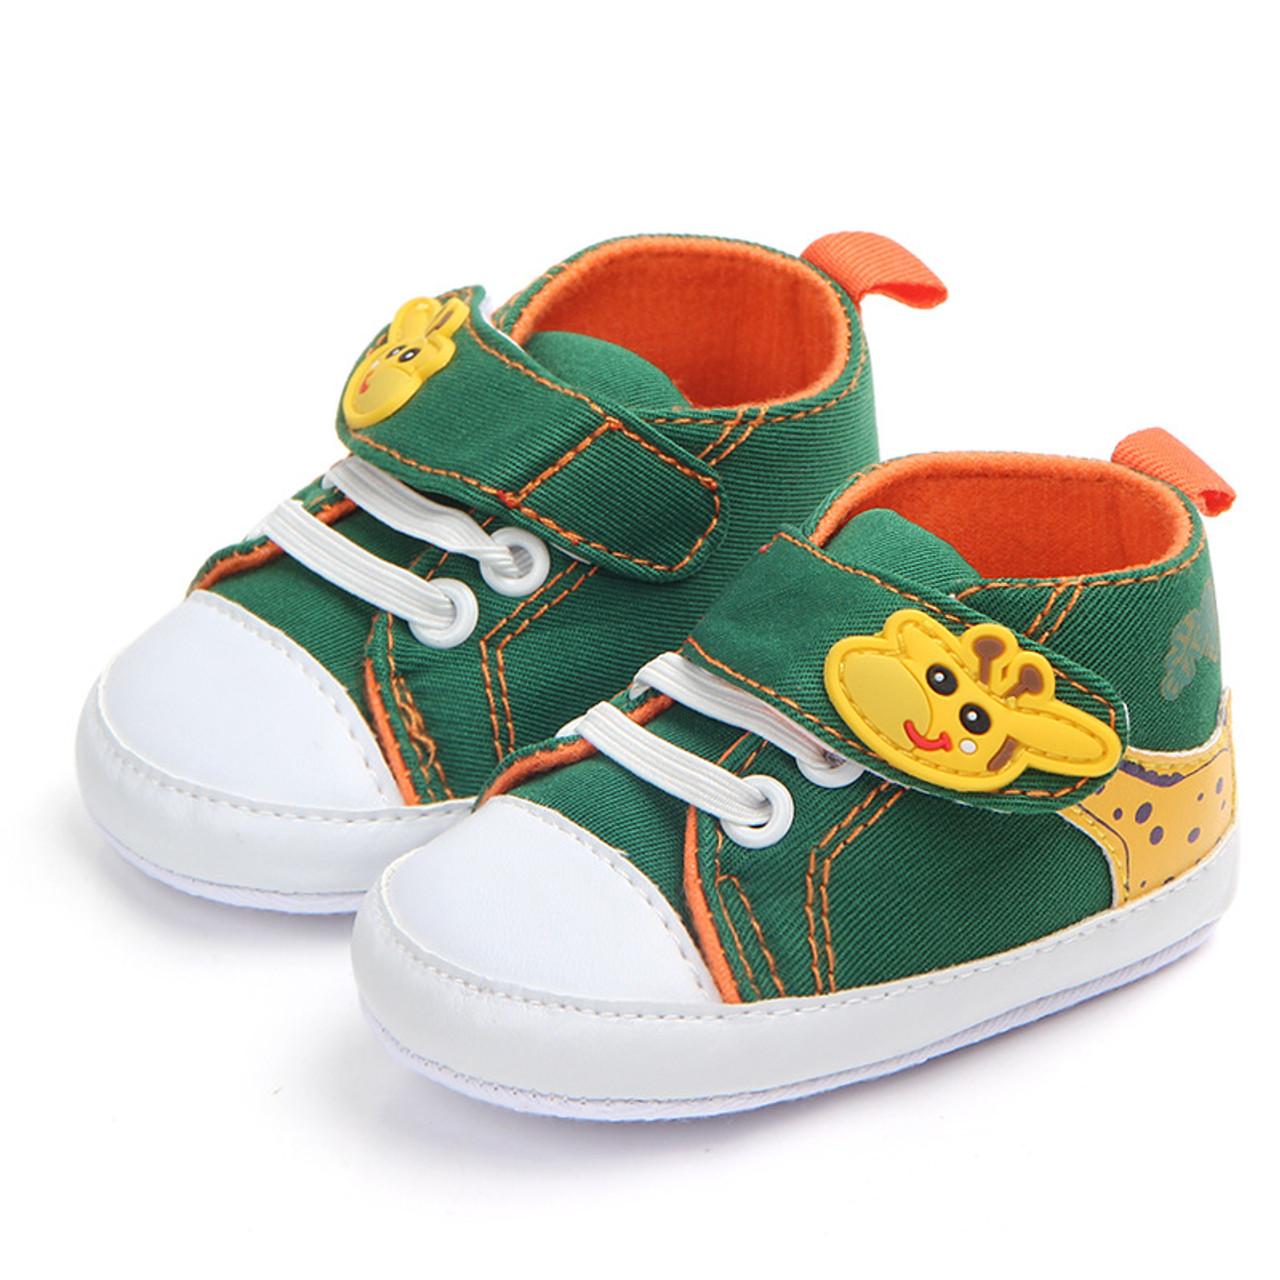 0-12M canvas baby shoes boys soft sole